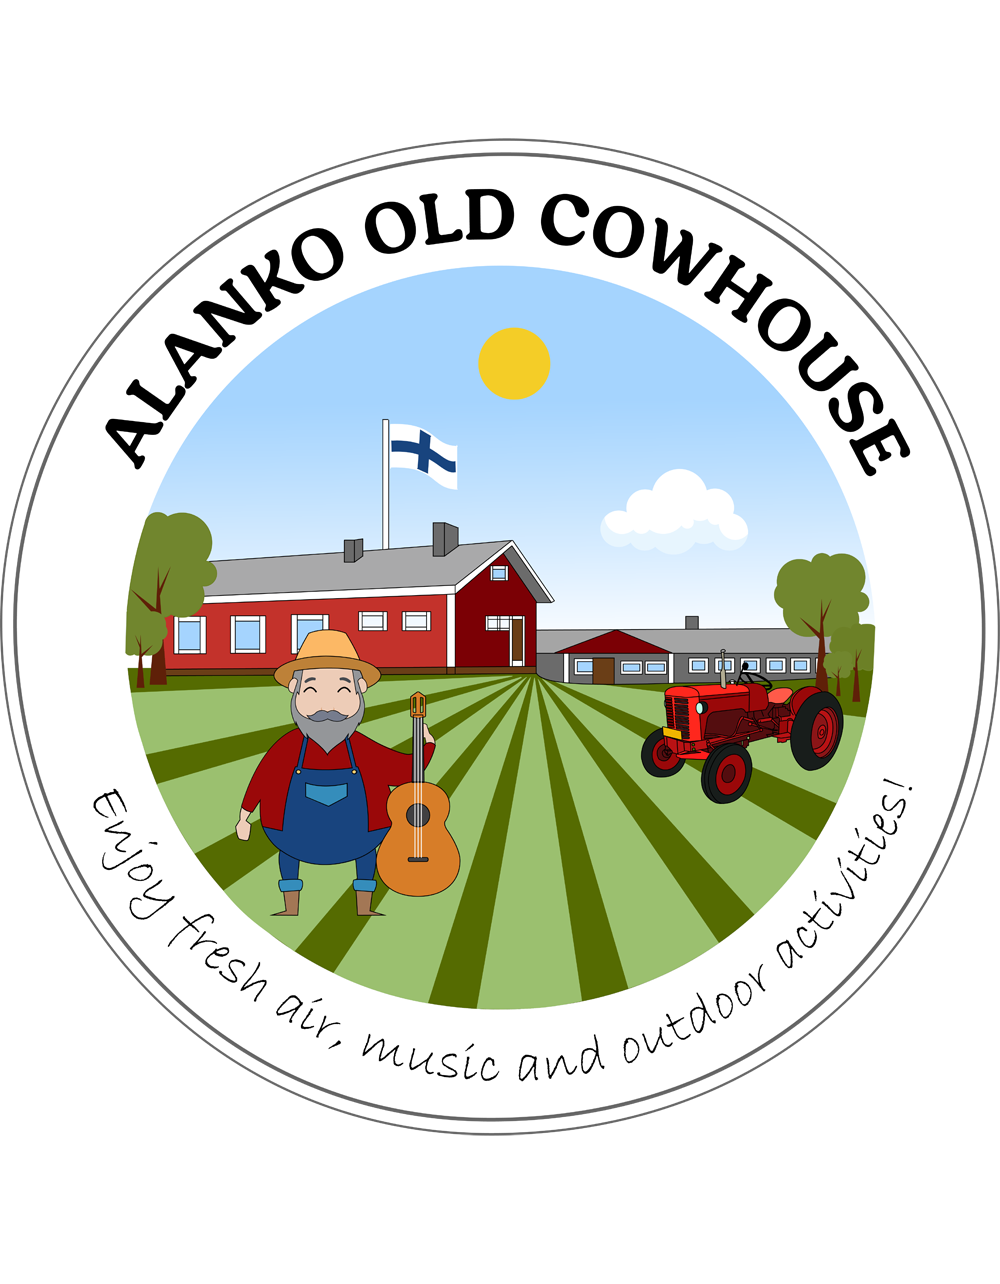 Alanko_old_cowhouse_logo_1000